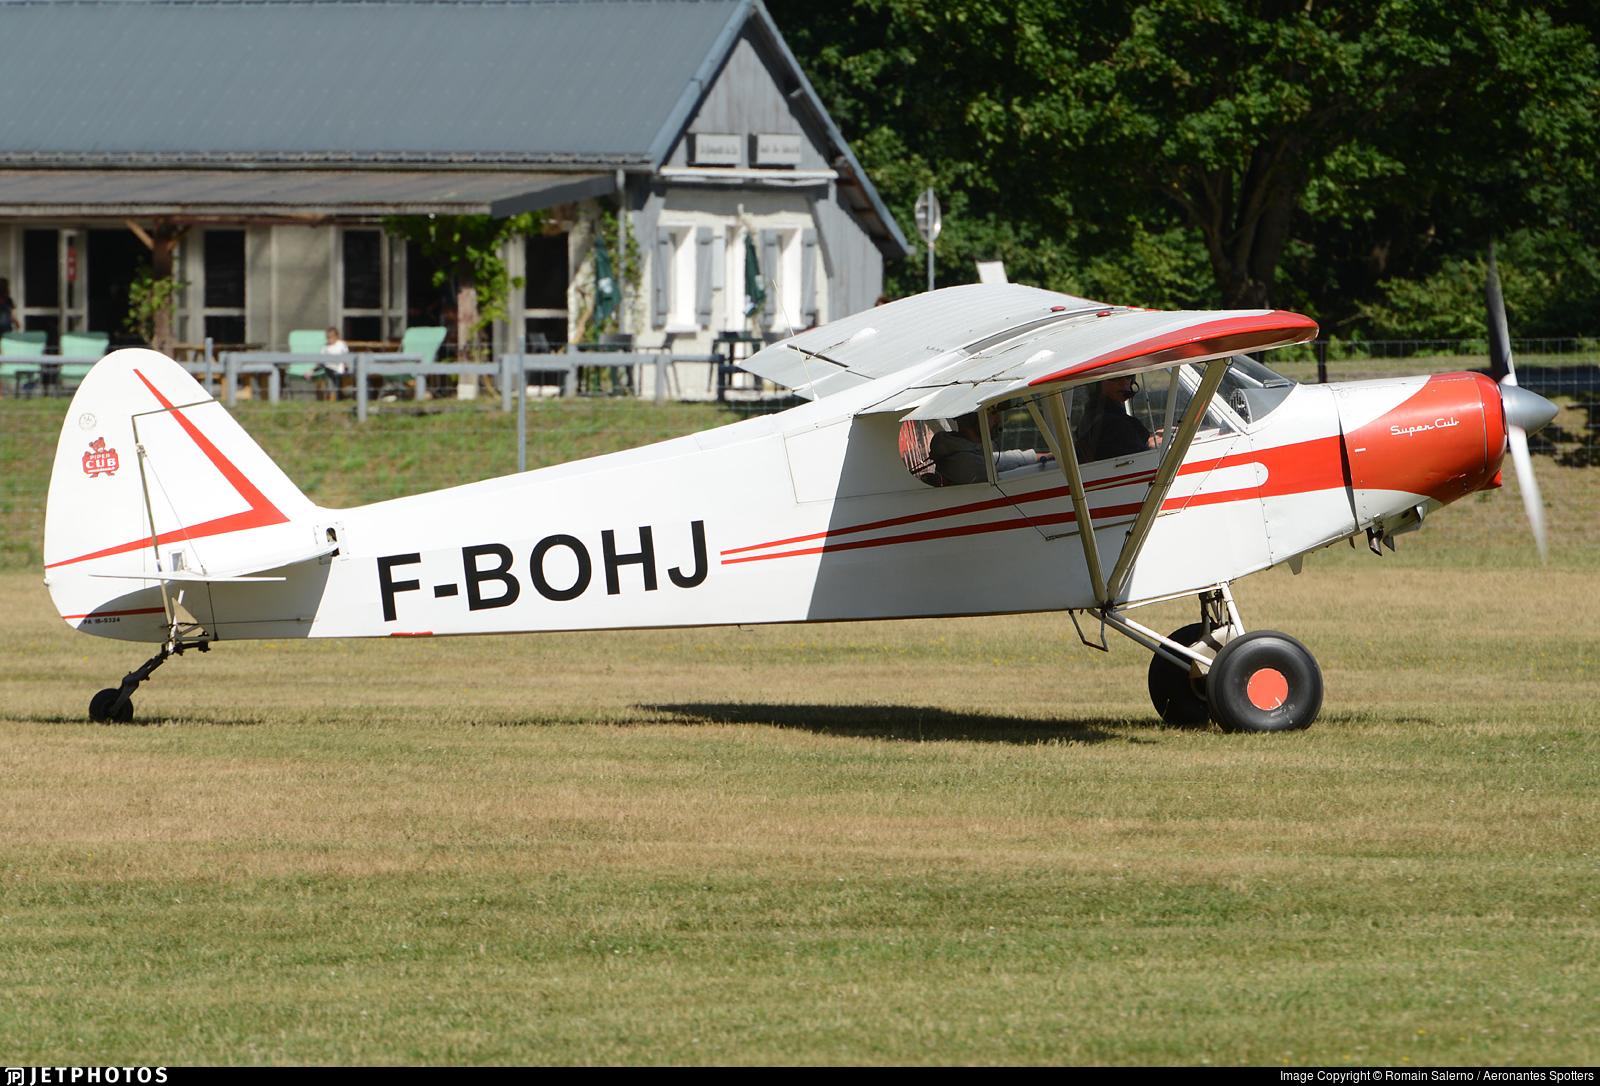 F-BOHJ - Piper PA-18-150 Super Cub - Aero Club - Icaria